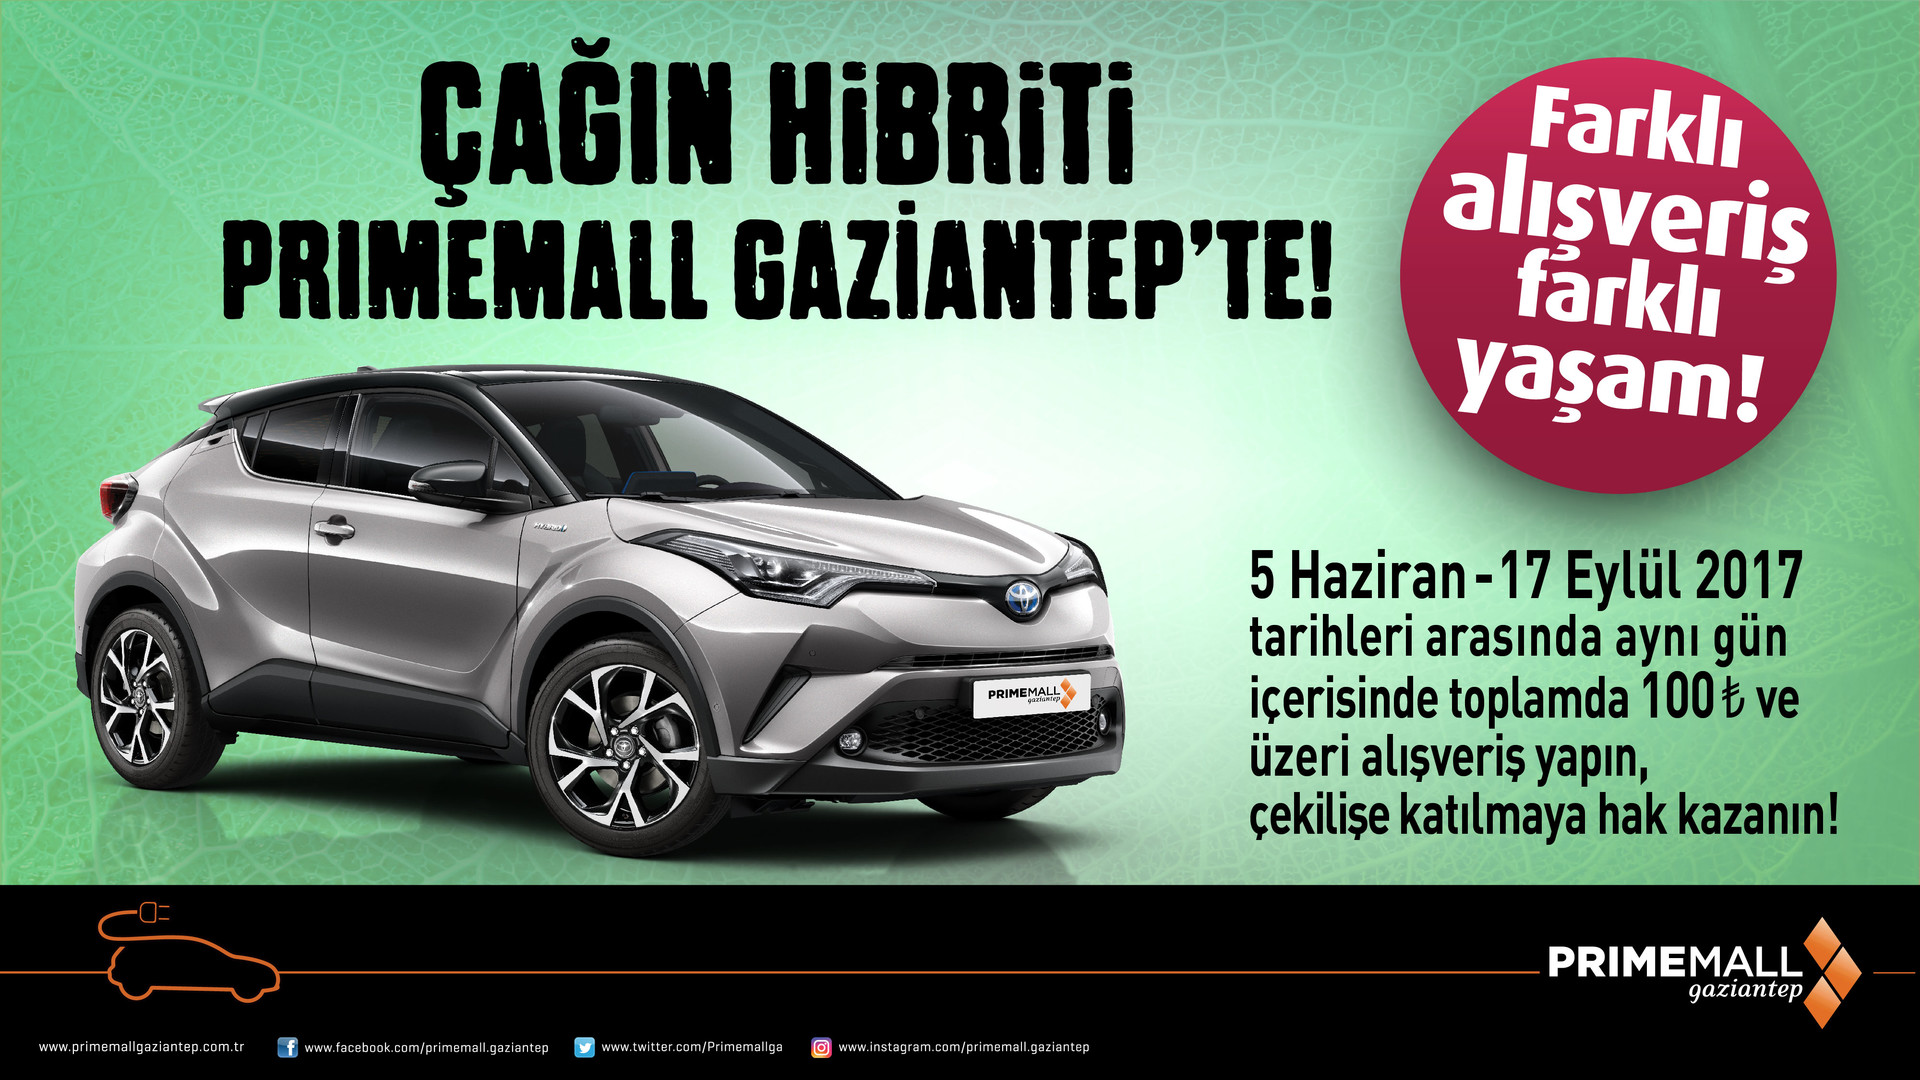 Çağın Hibriti Primemall Gaziantep'te